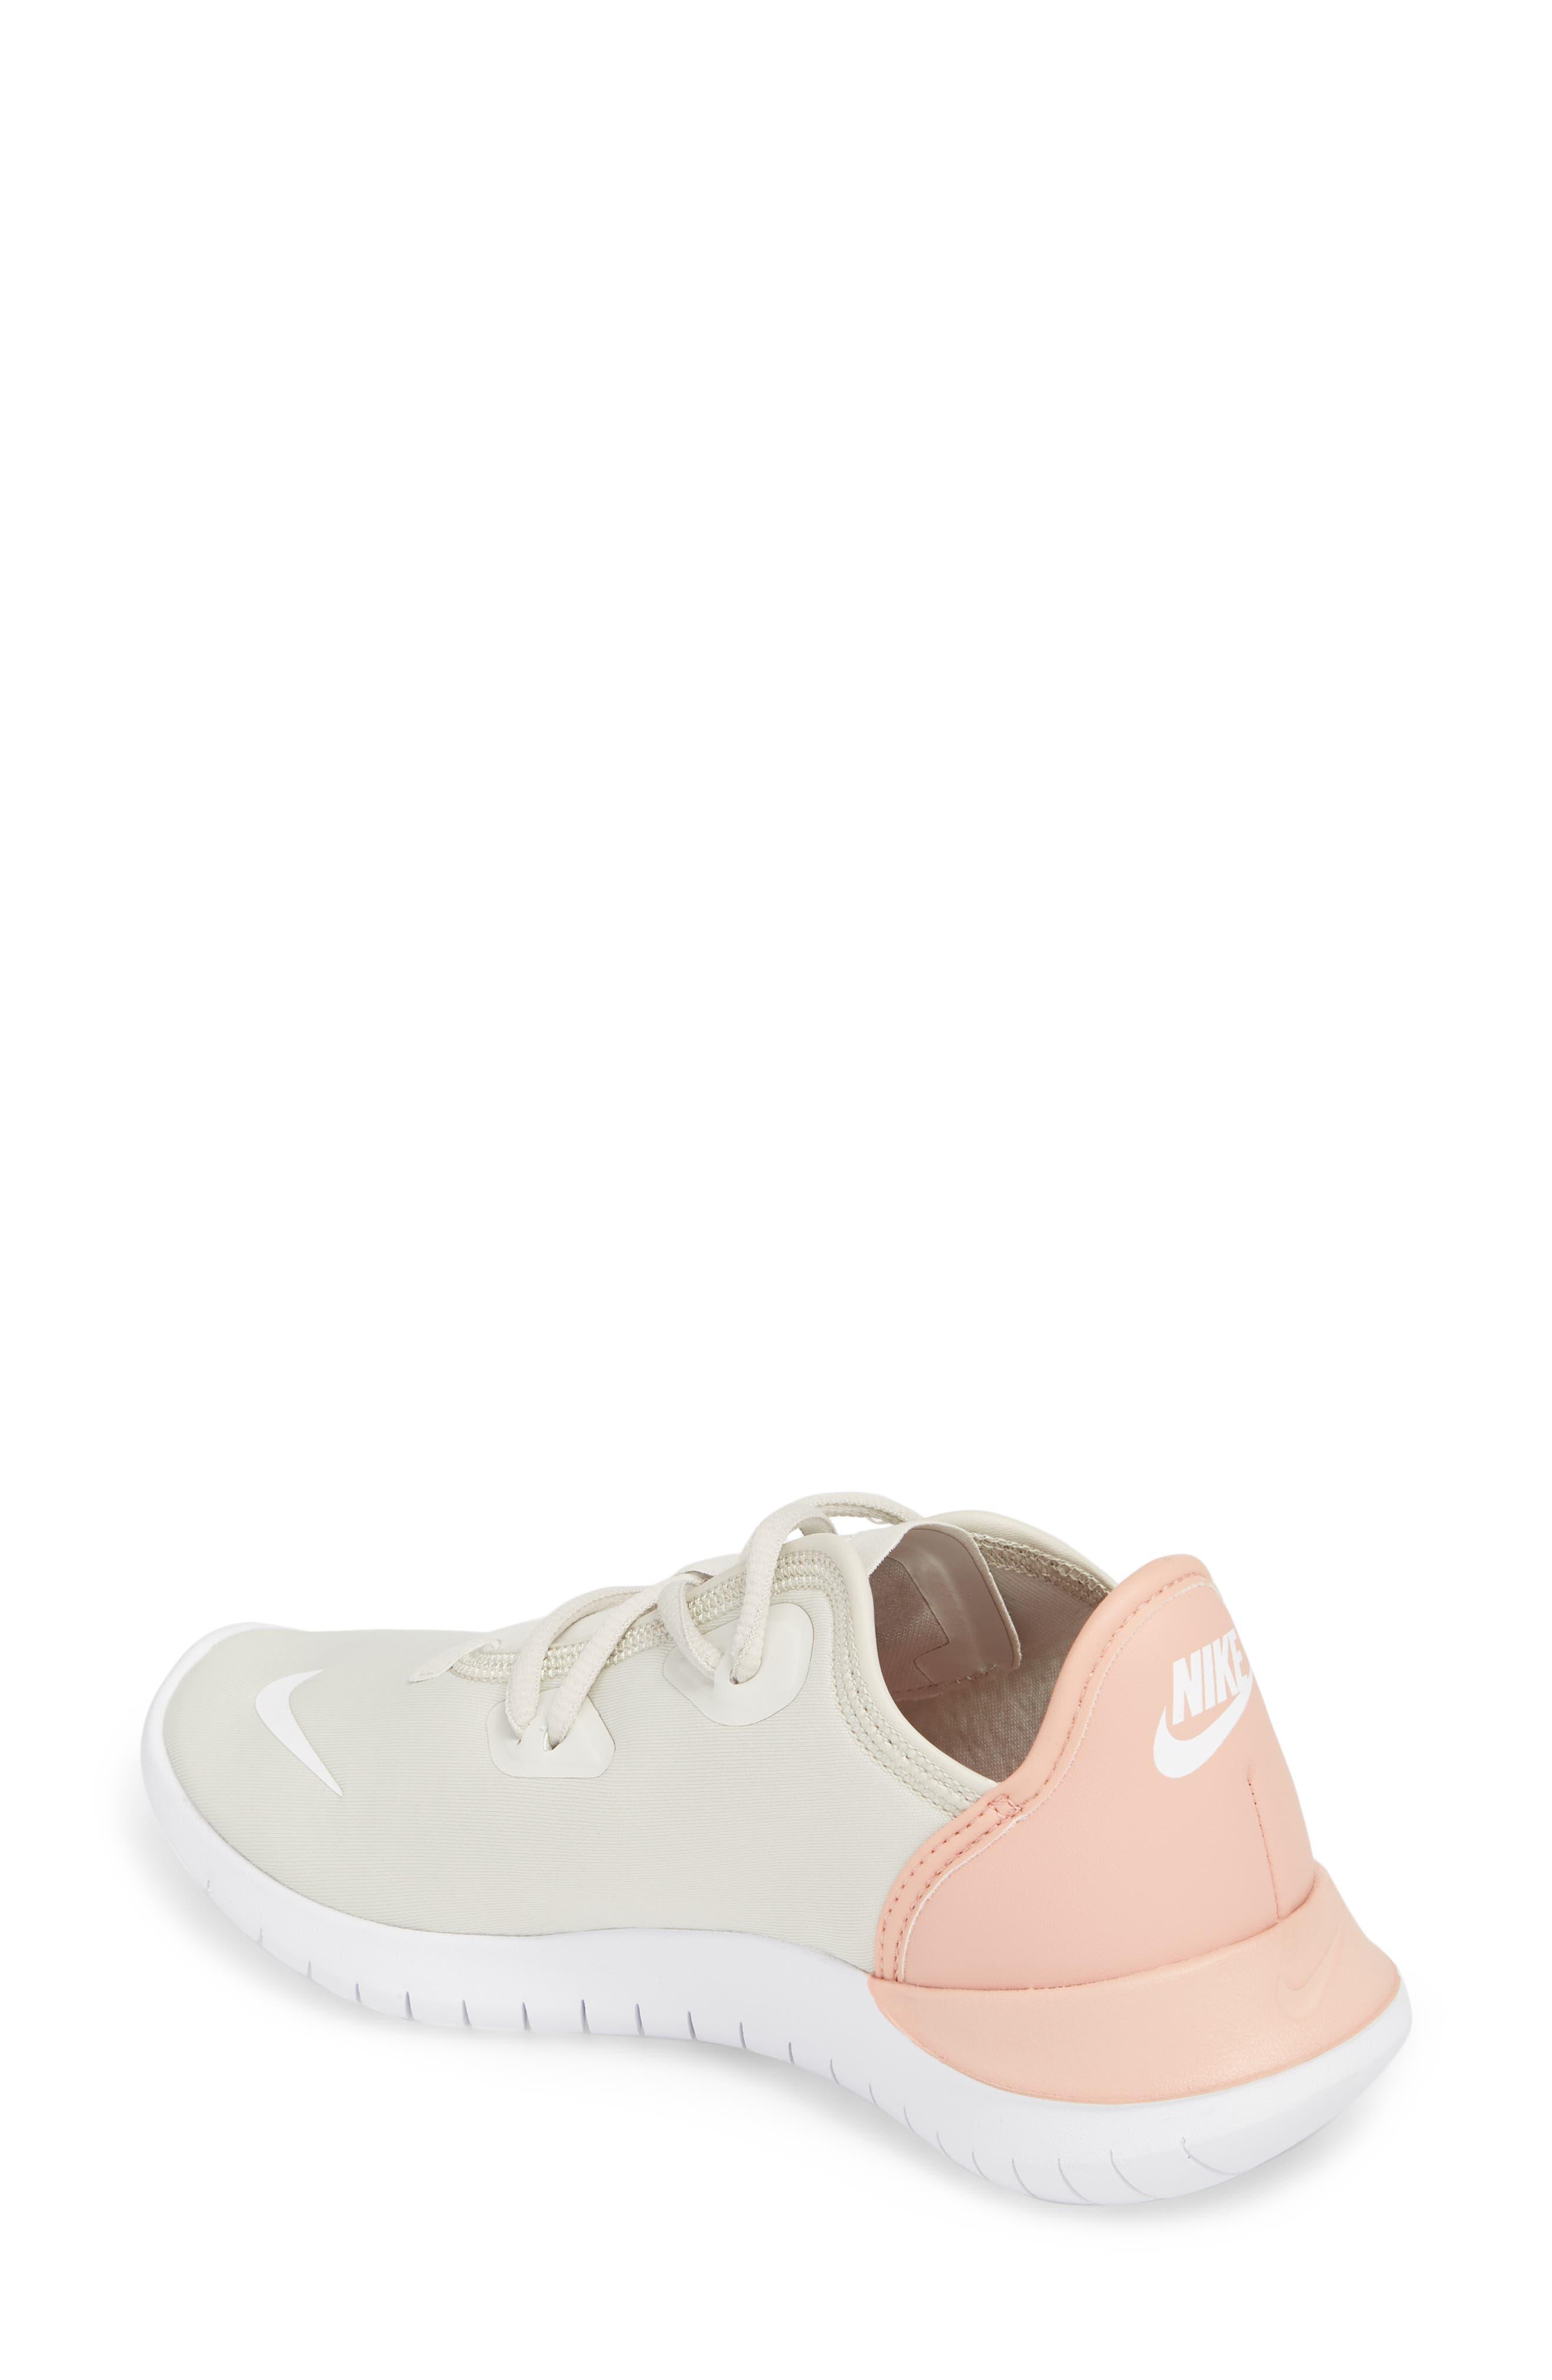 Hakata Sneaker,                             Alternate thumbnail 2, color,                             Light Bone/ White/ Coral